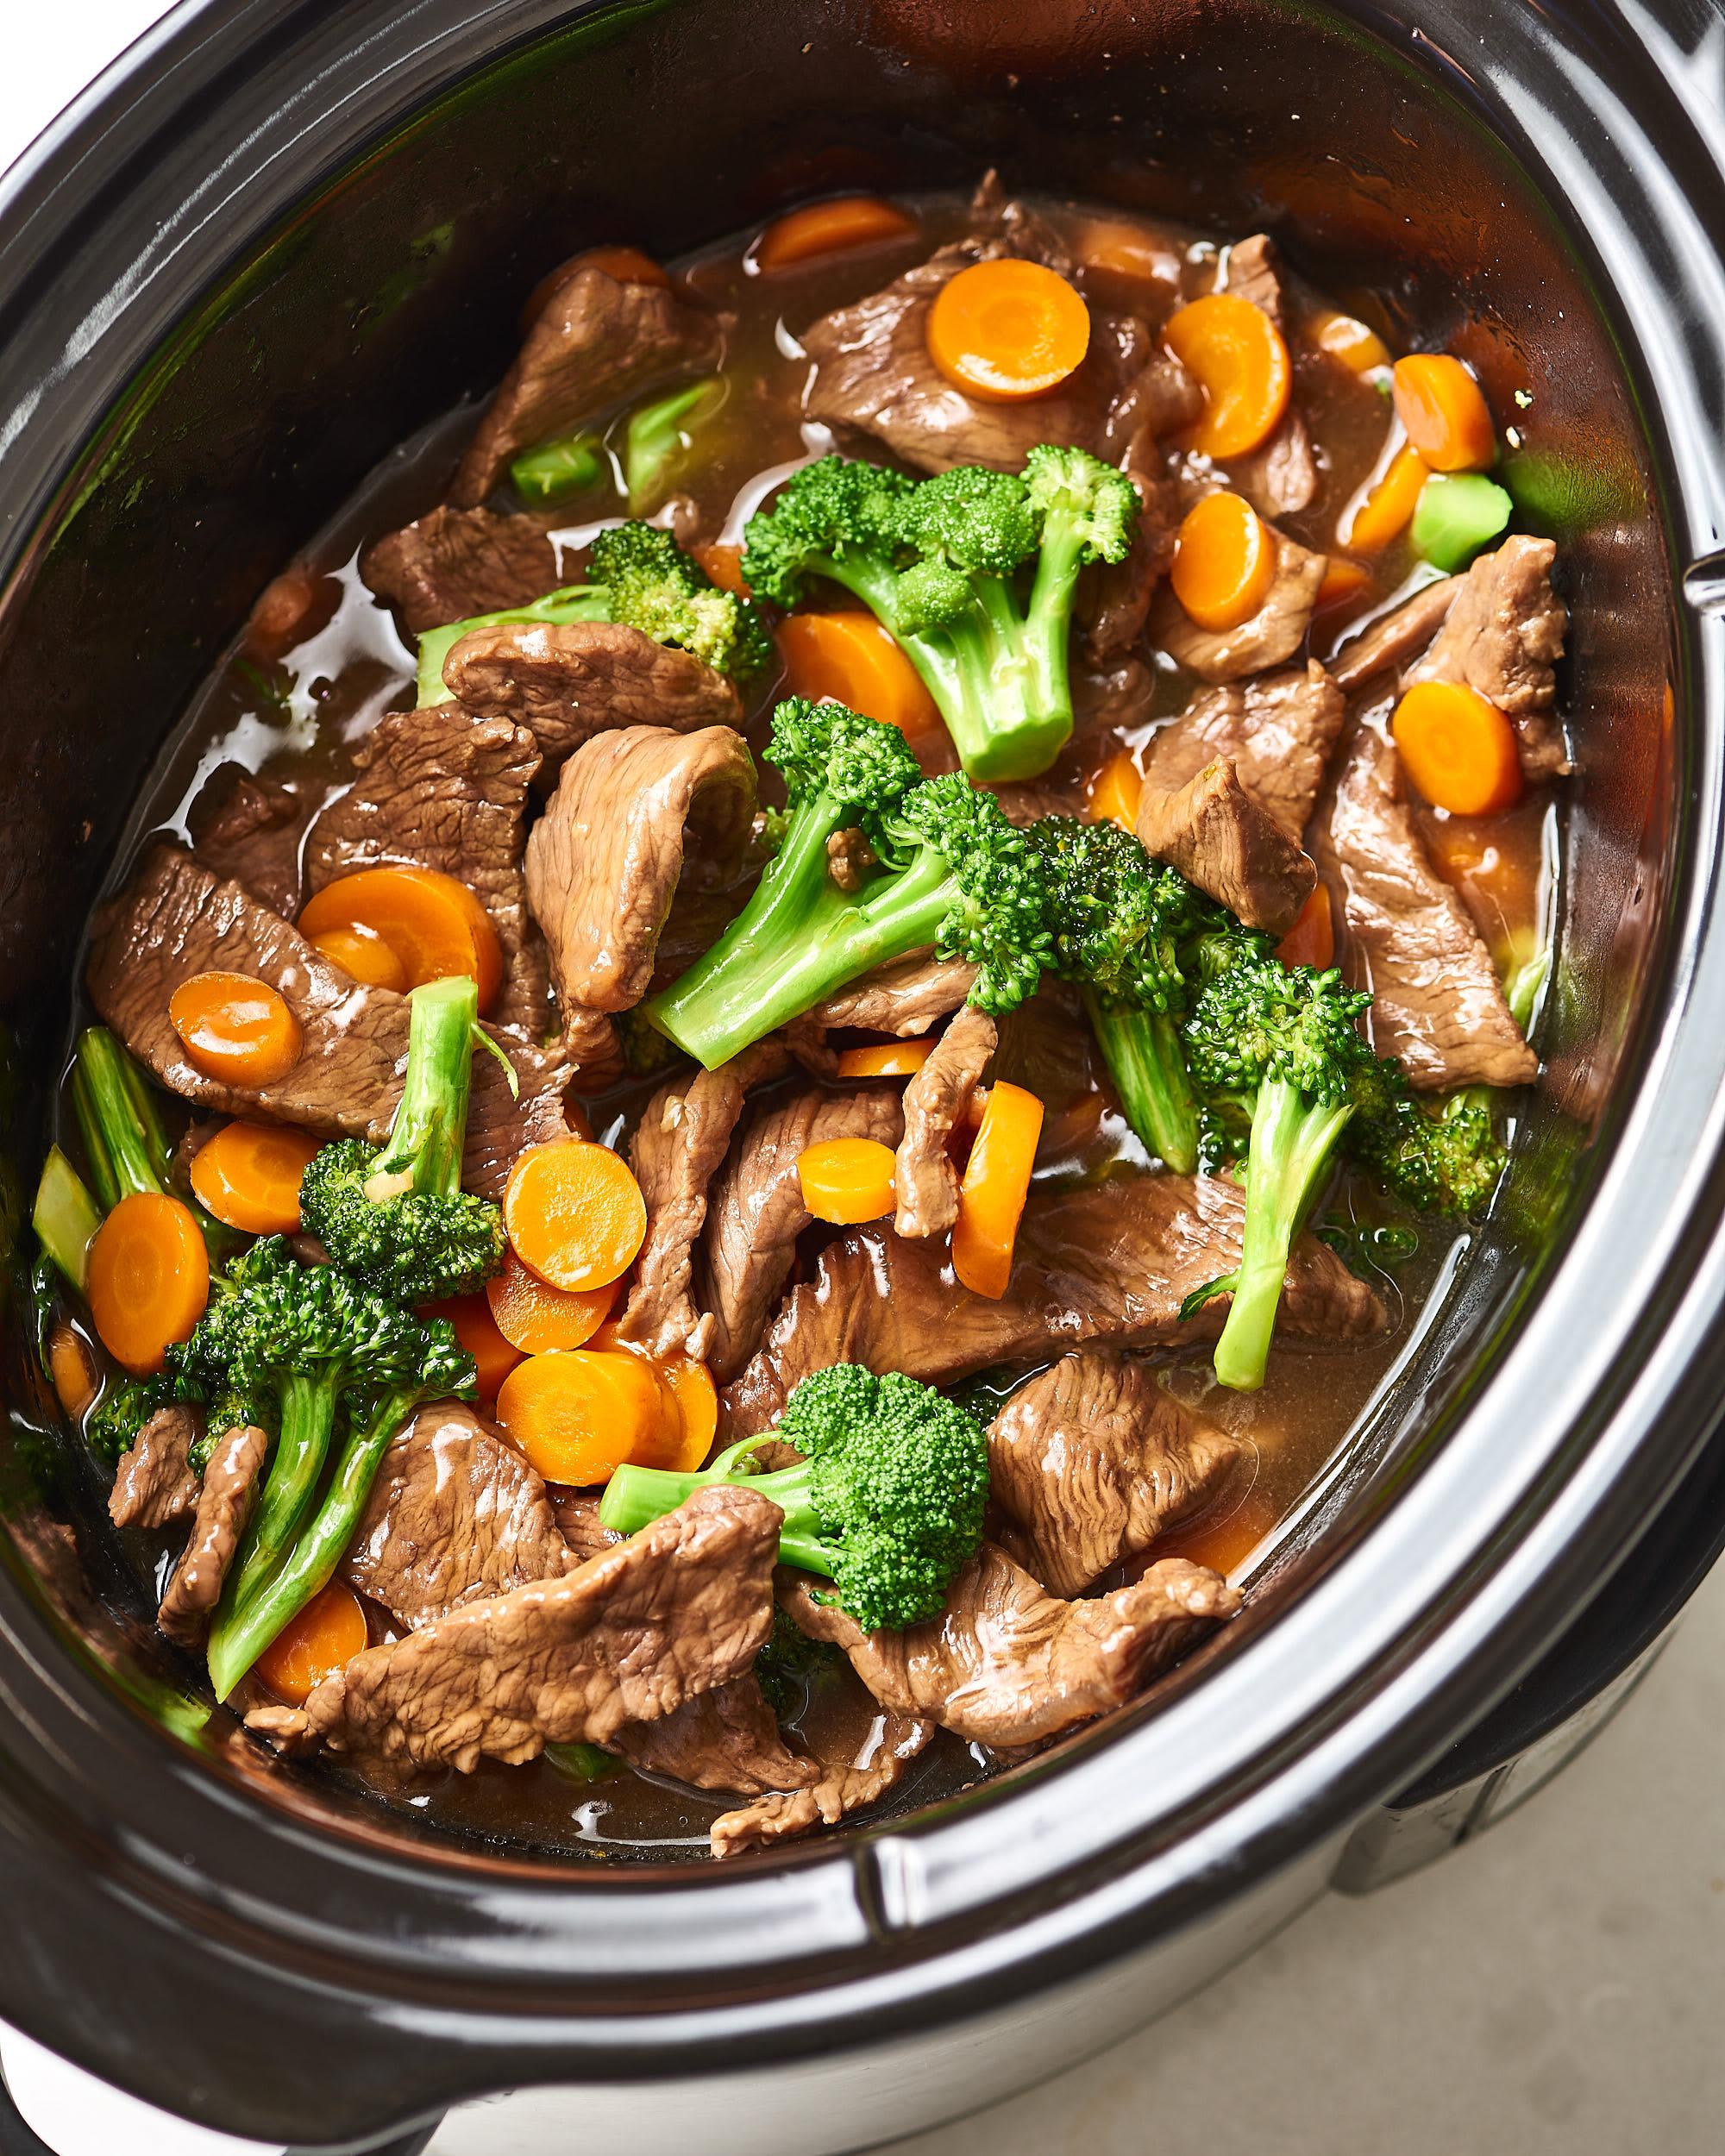 75+ Crock Pot Recipes For Breakfast, Lunch & Dinner